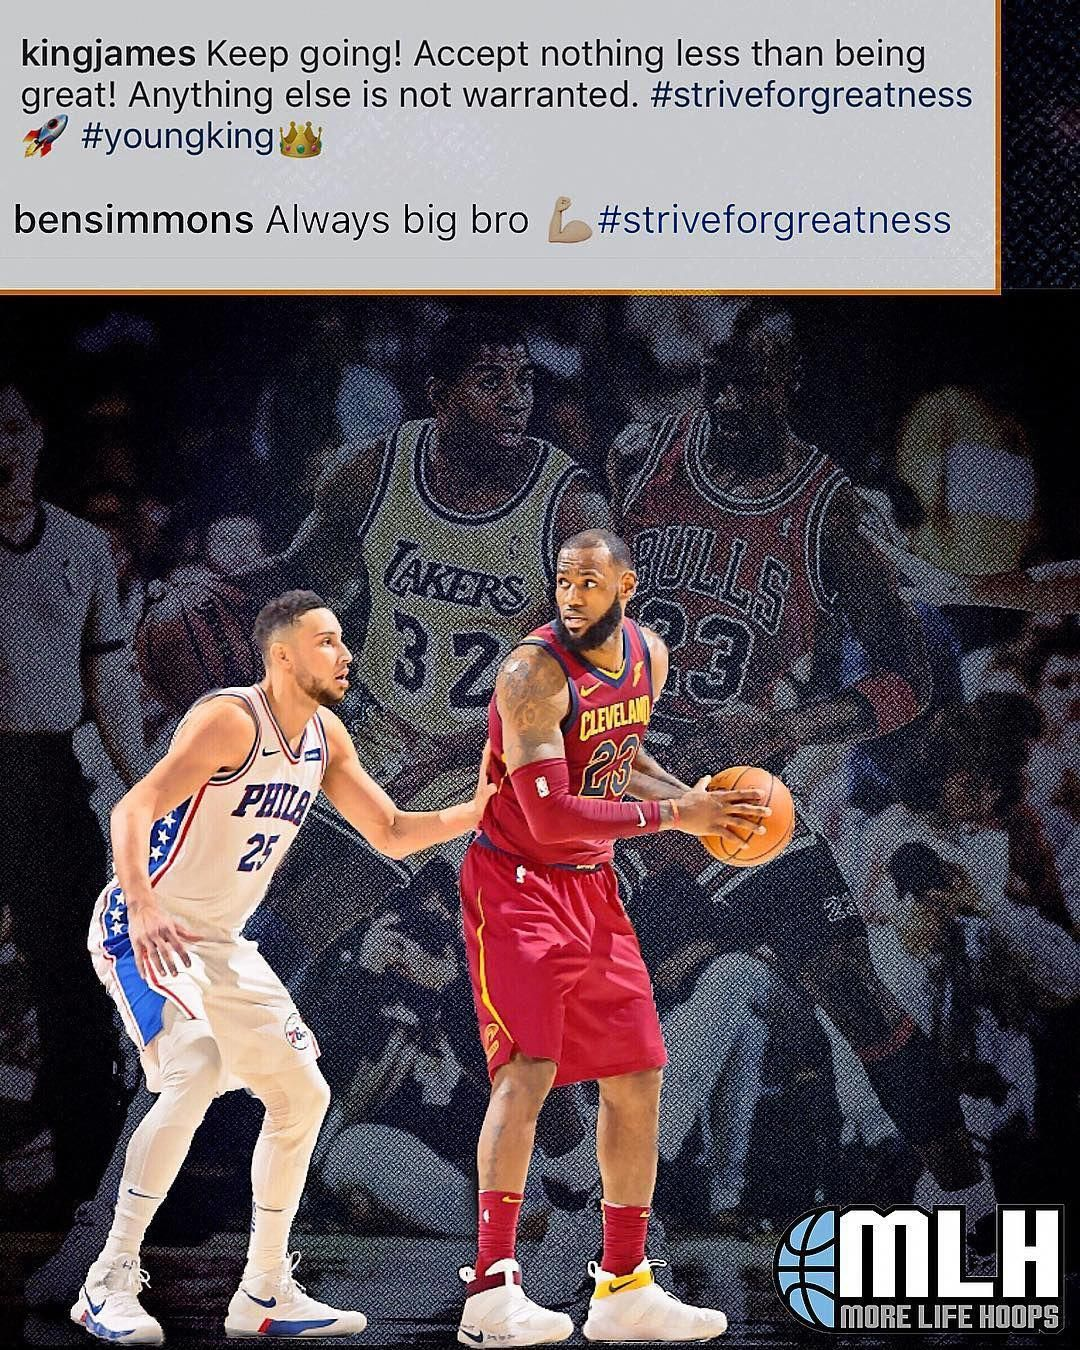 Lebron James And Ben Simmons Show Each Other Respect On Instagram Kingjames Lebronjames Lebron Bensi Basketball Girls Basketball Games For Kids Ben Simmons